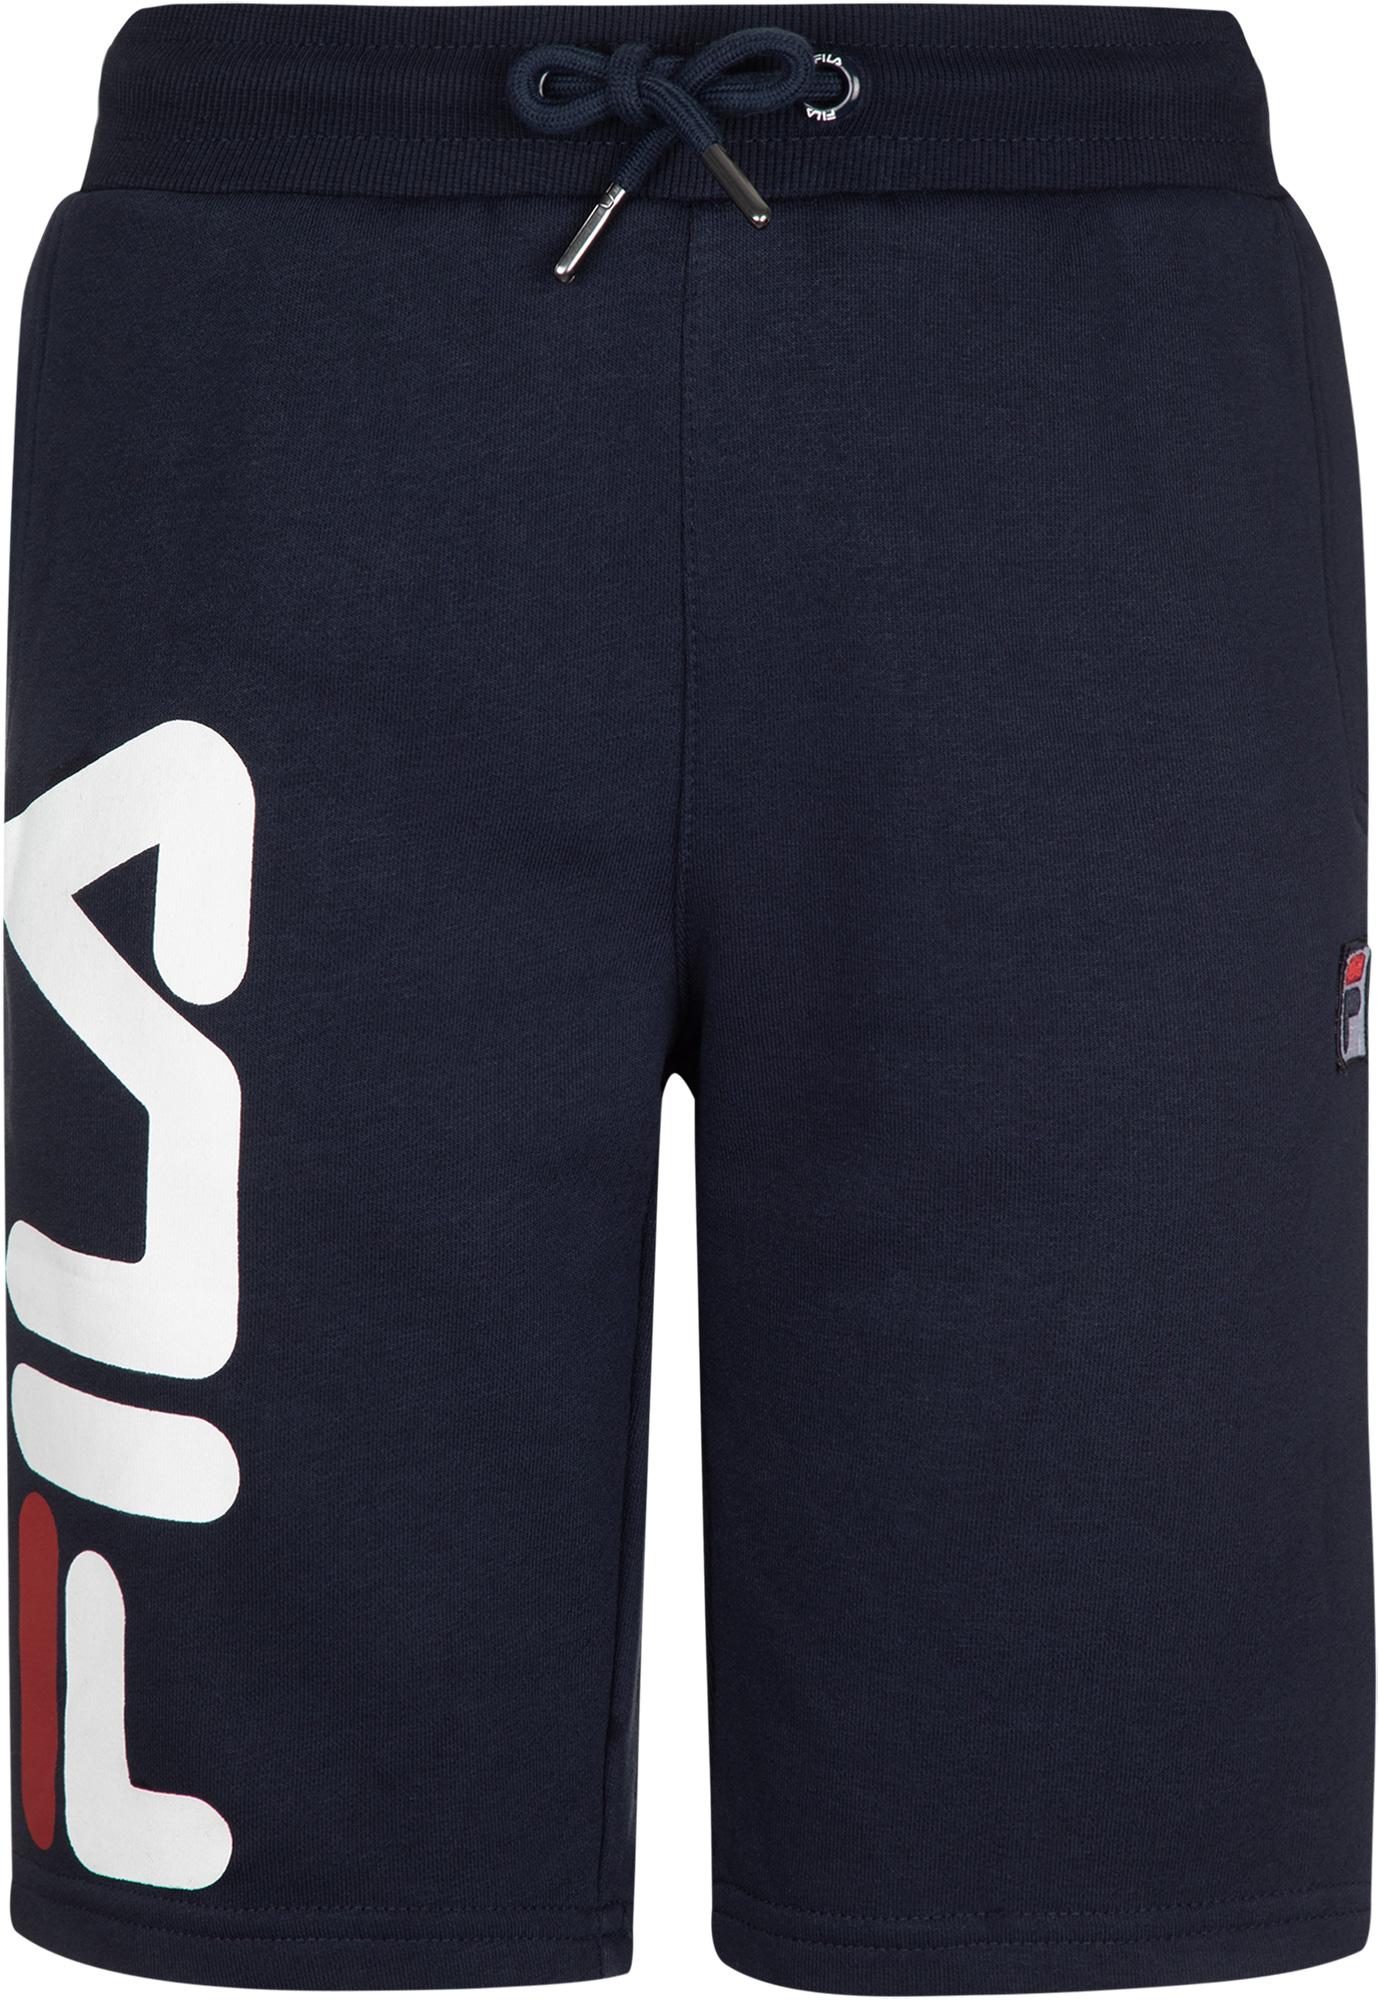 Фото - FILA Шорты для мальчиков FILA, размер 164 fila шорты плавательные для мальчиков fila размер 164